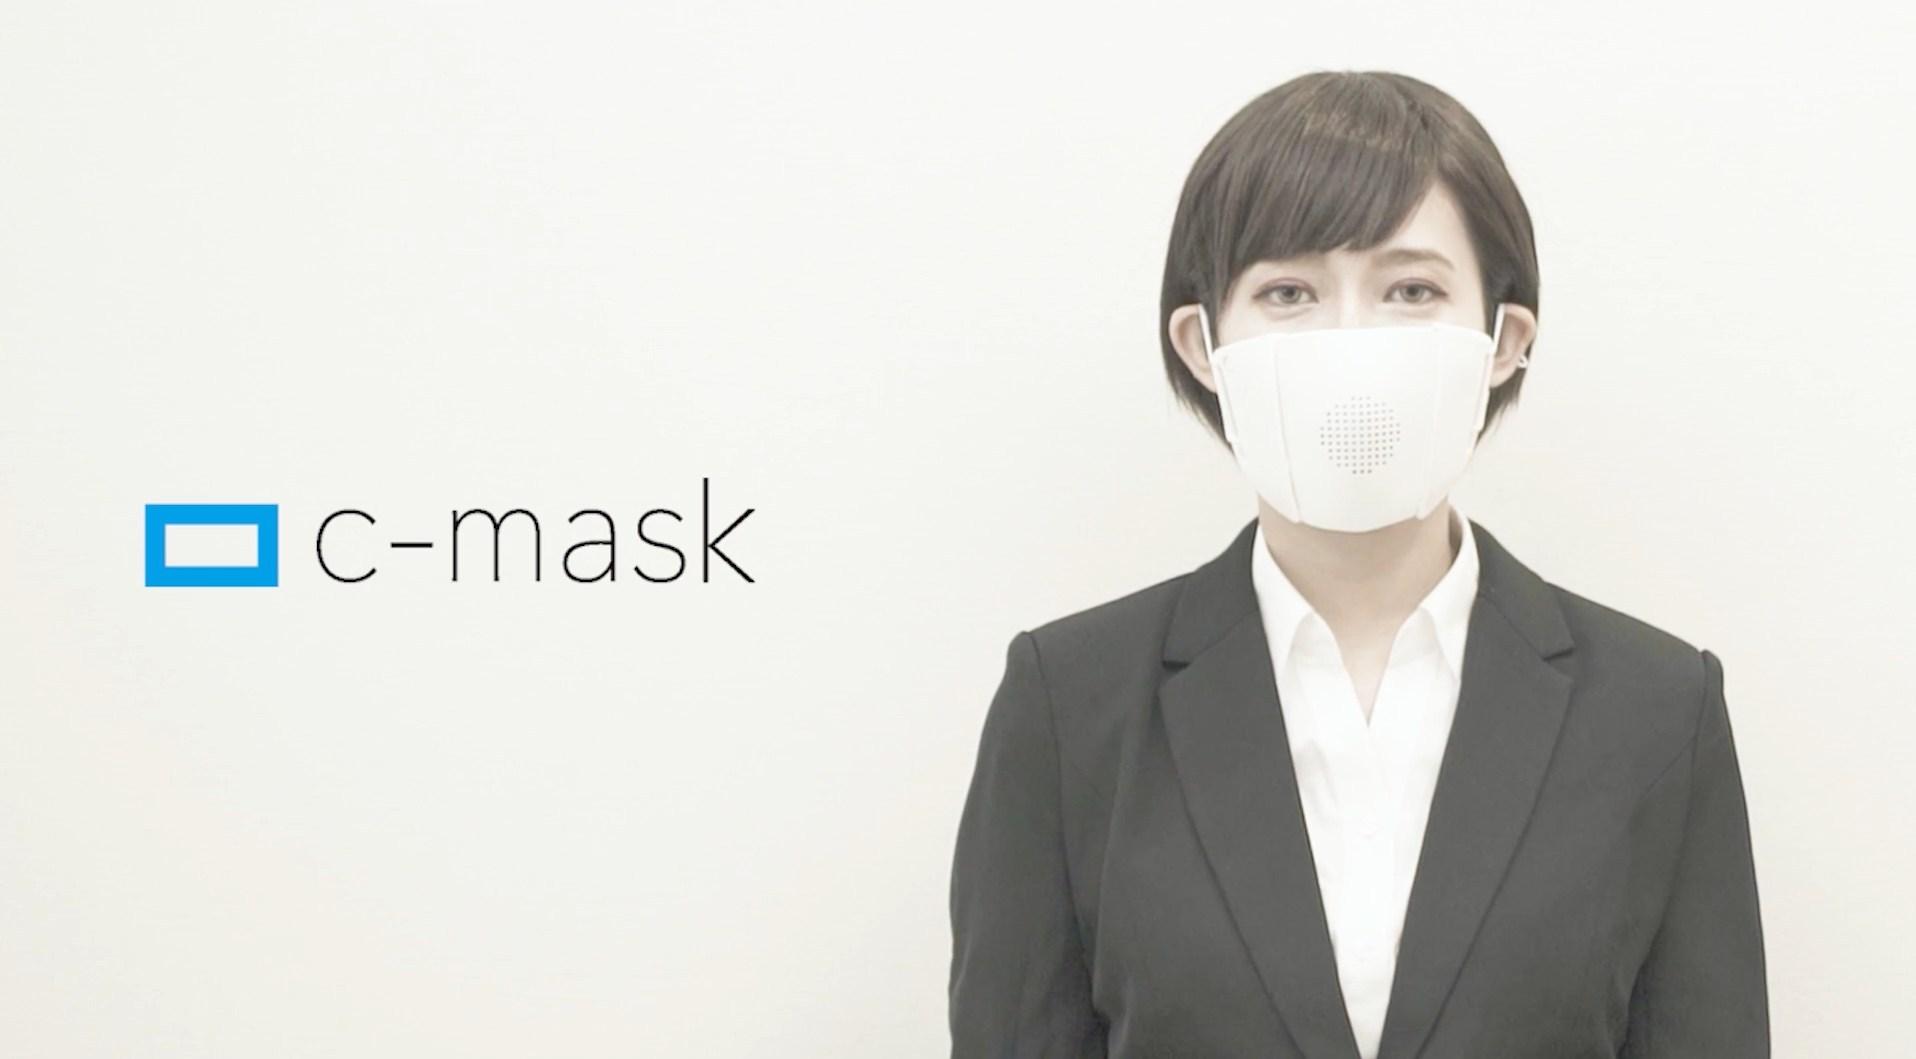 C-Mask by Donut Robotics